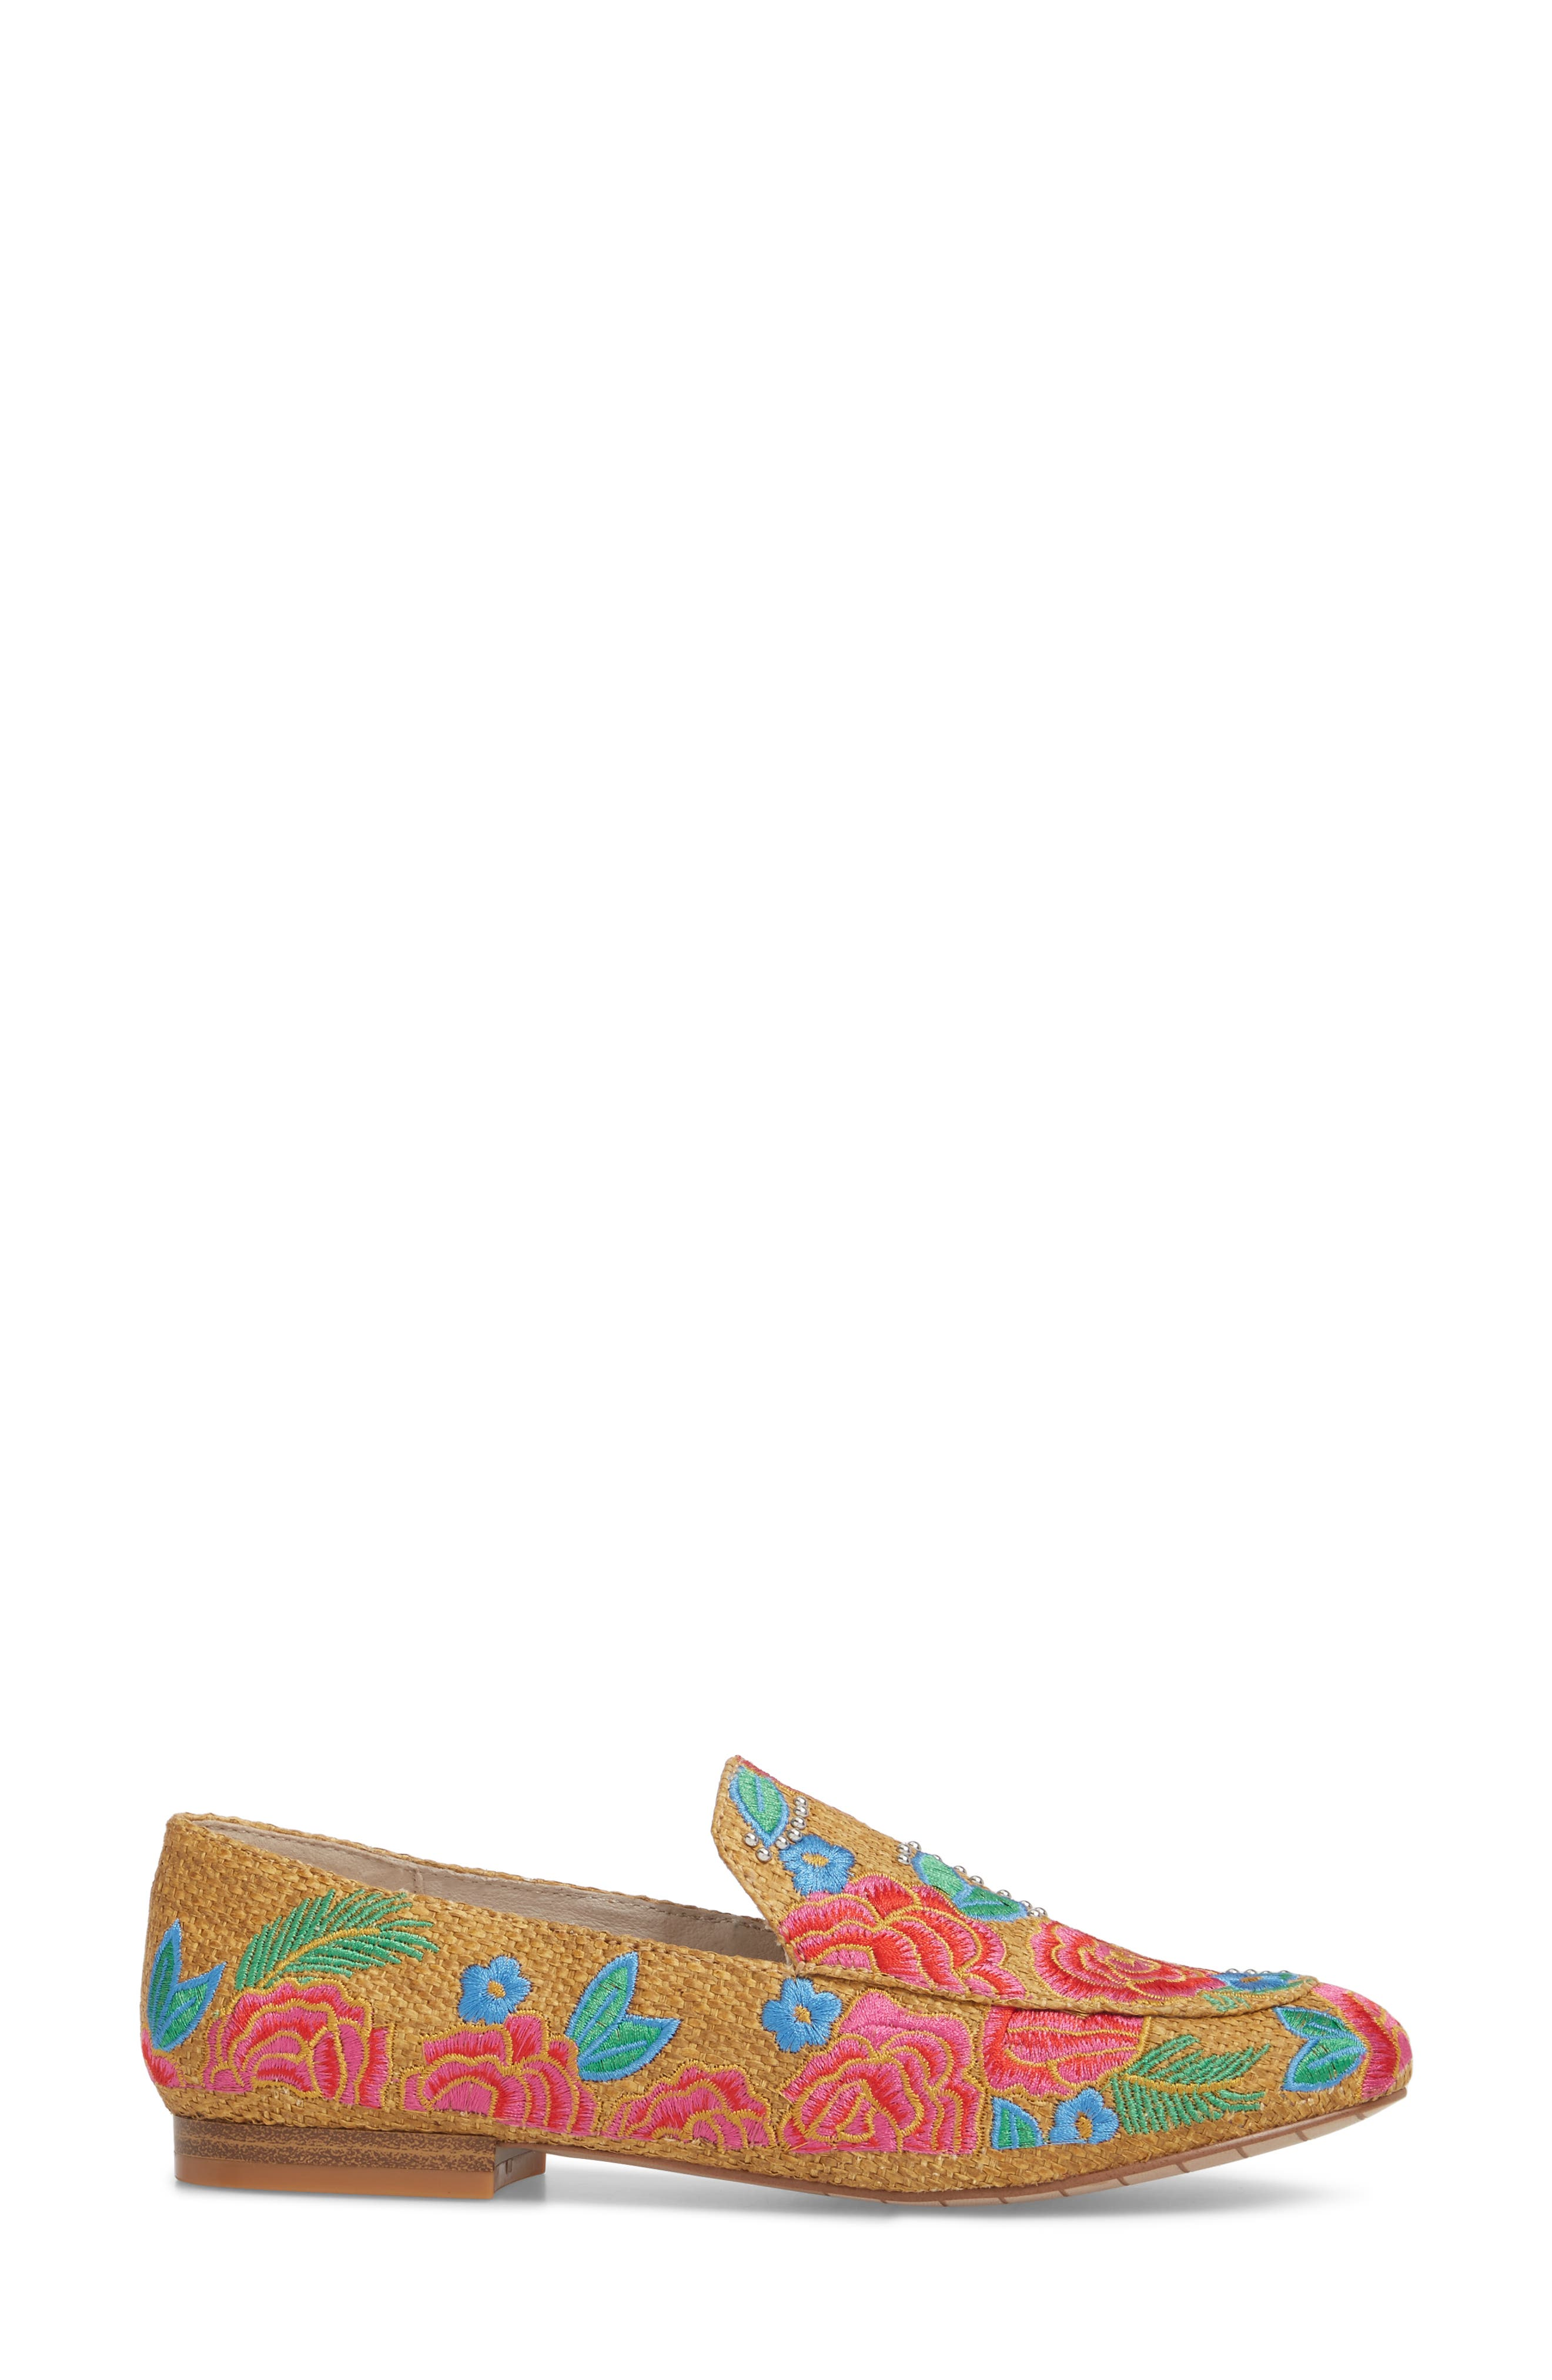 Westley Slip-On,                             Alternate thumbnail 3, color,                             Natural Raffia Fabric